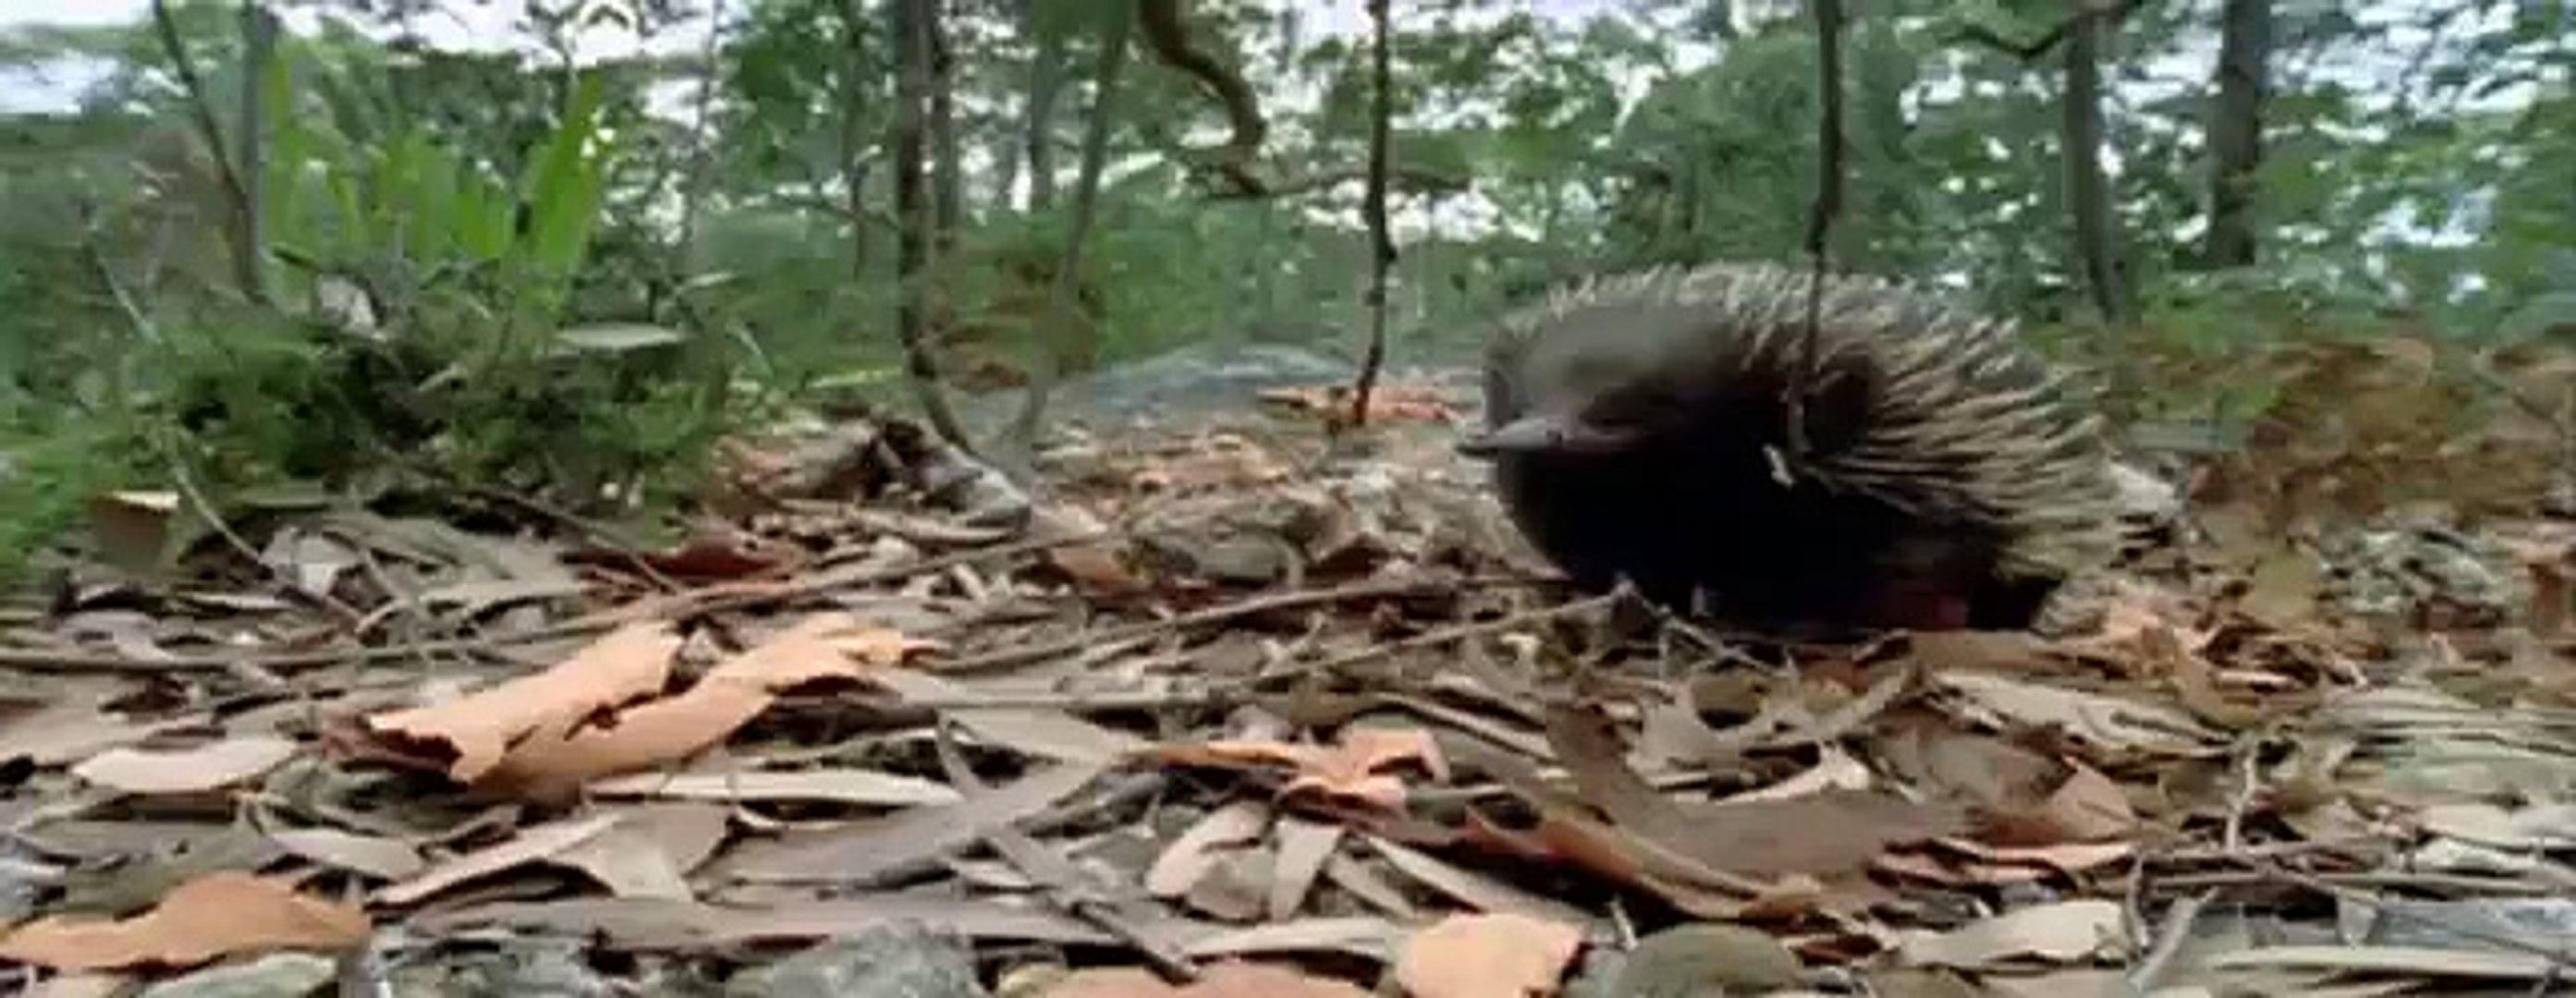 Echidna - My animal friends - Animals Documentary -Kids educational Videos